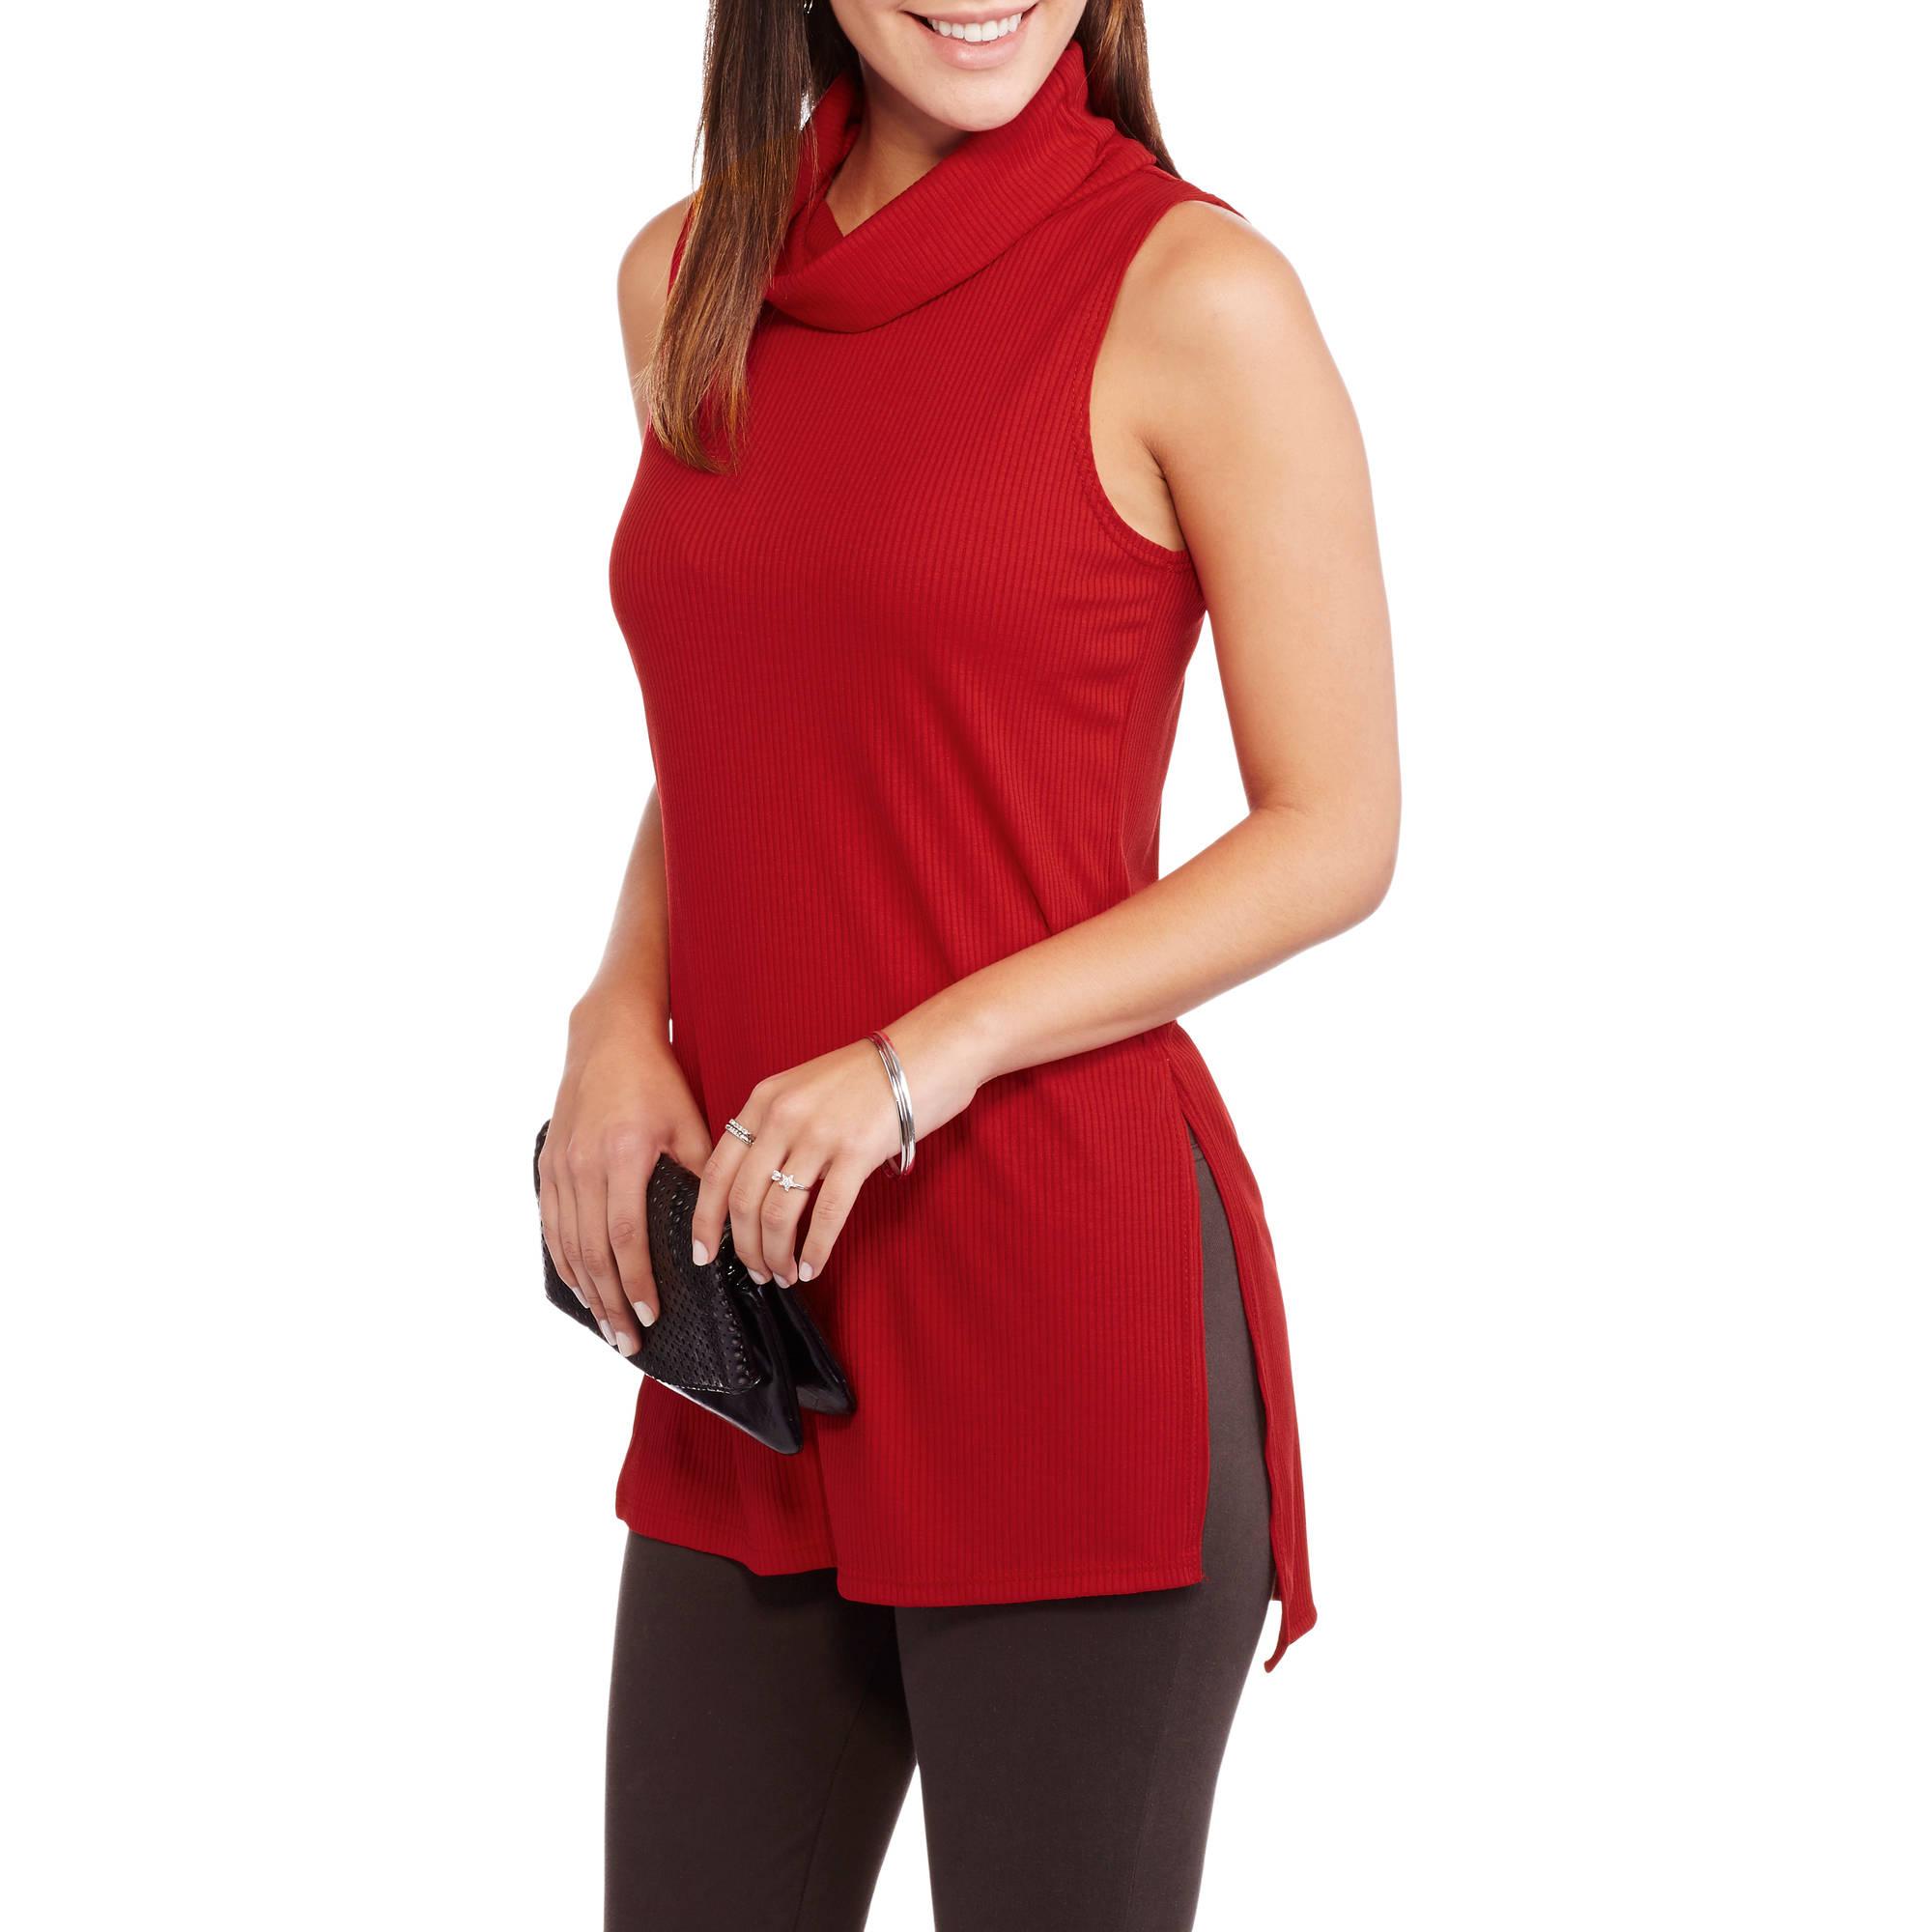 9th Street Apparel Women's Solid Sleeveless Mock Neck Top